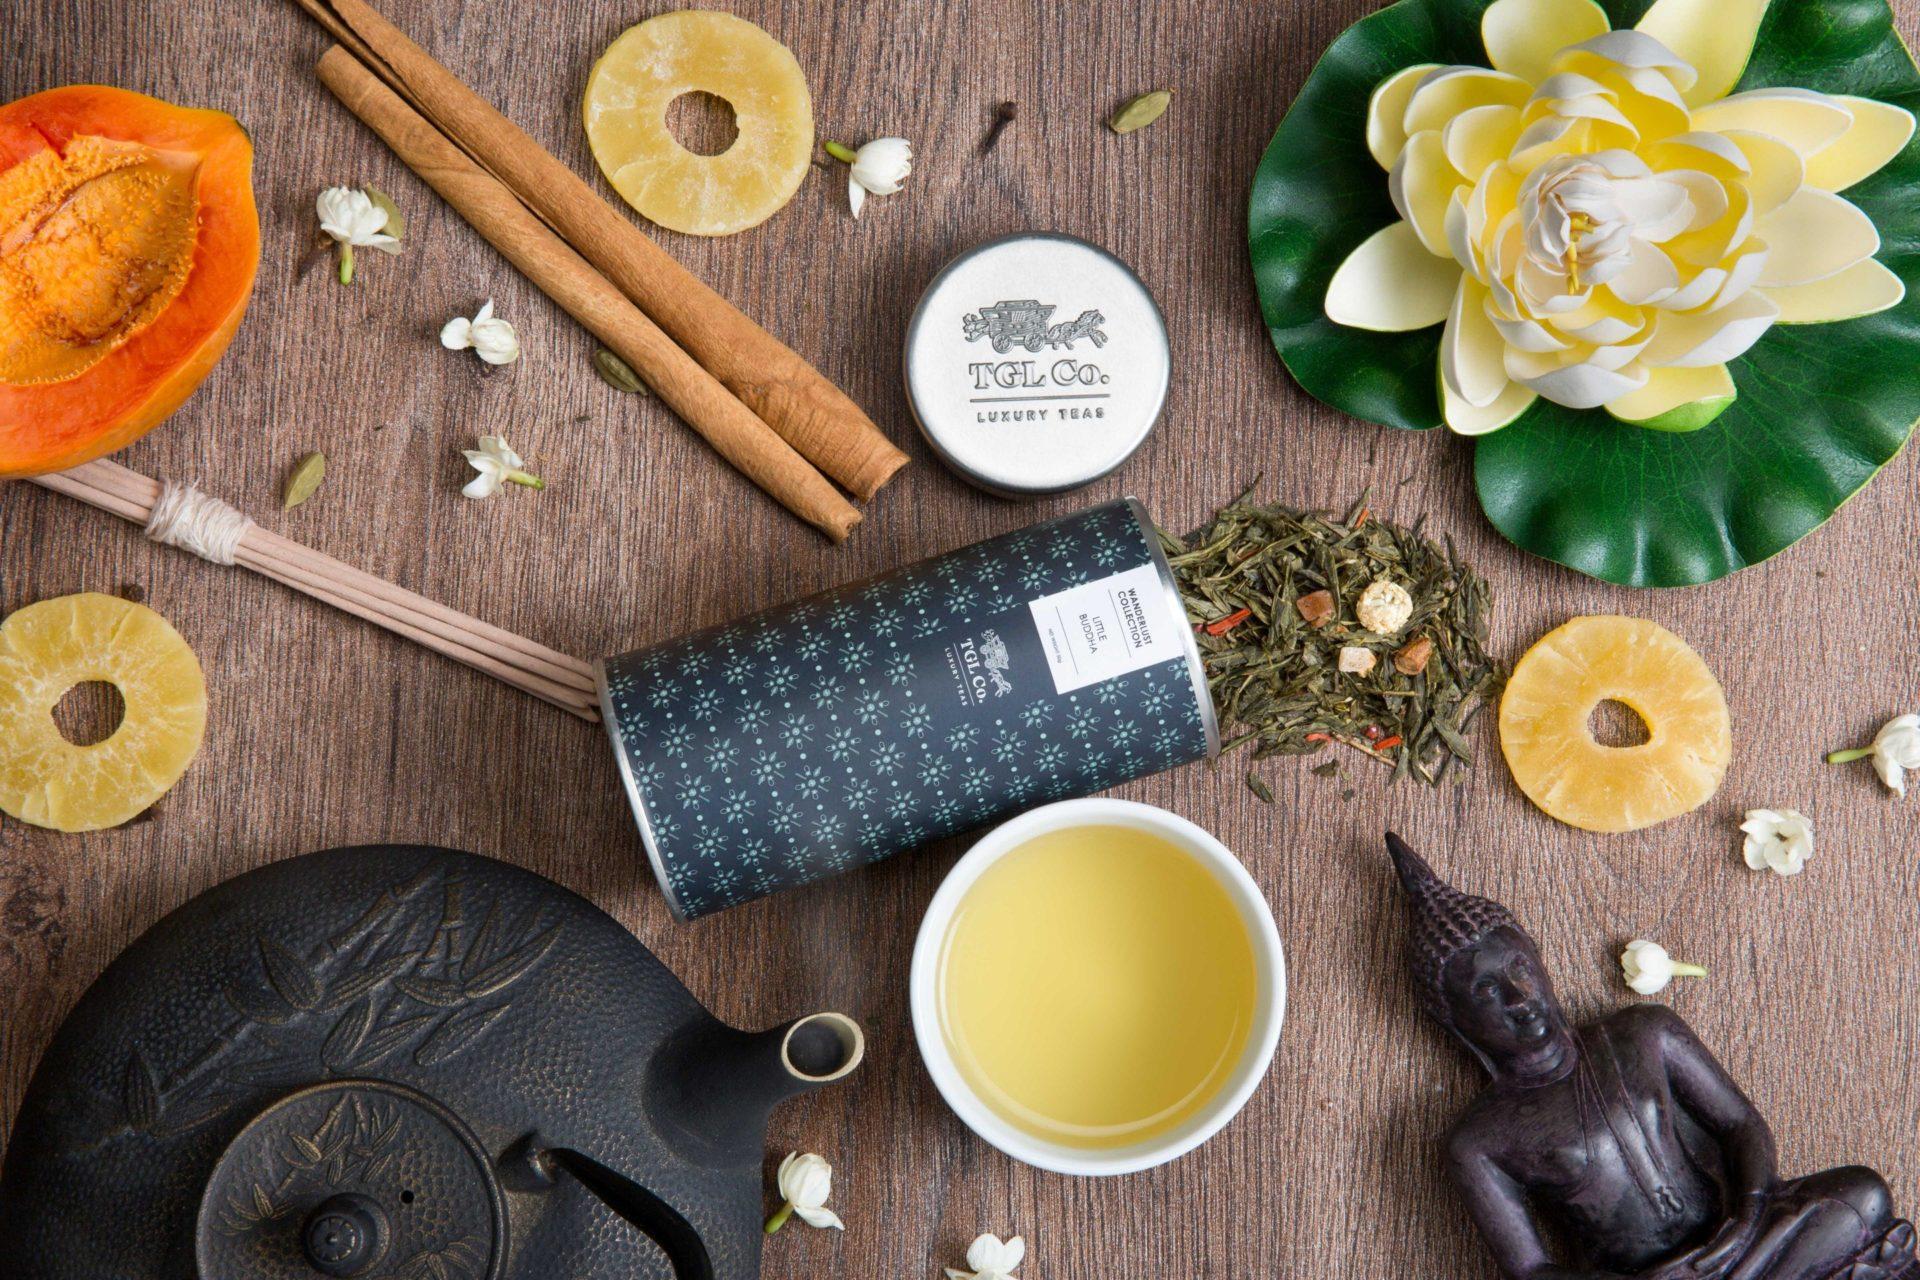 Artisanal teas in India, The Good Life Co.